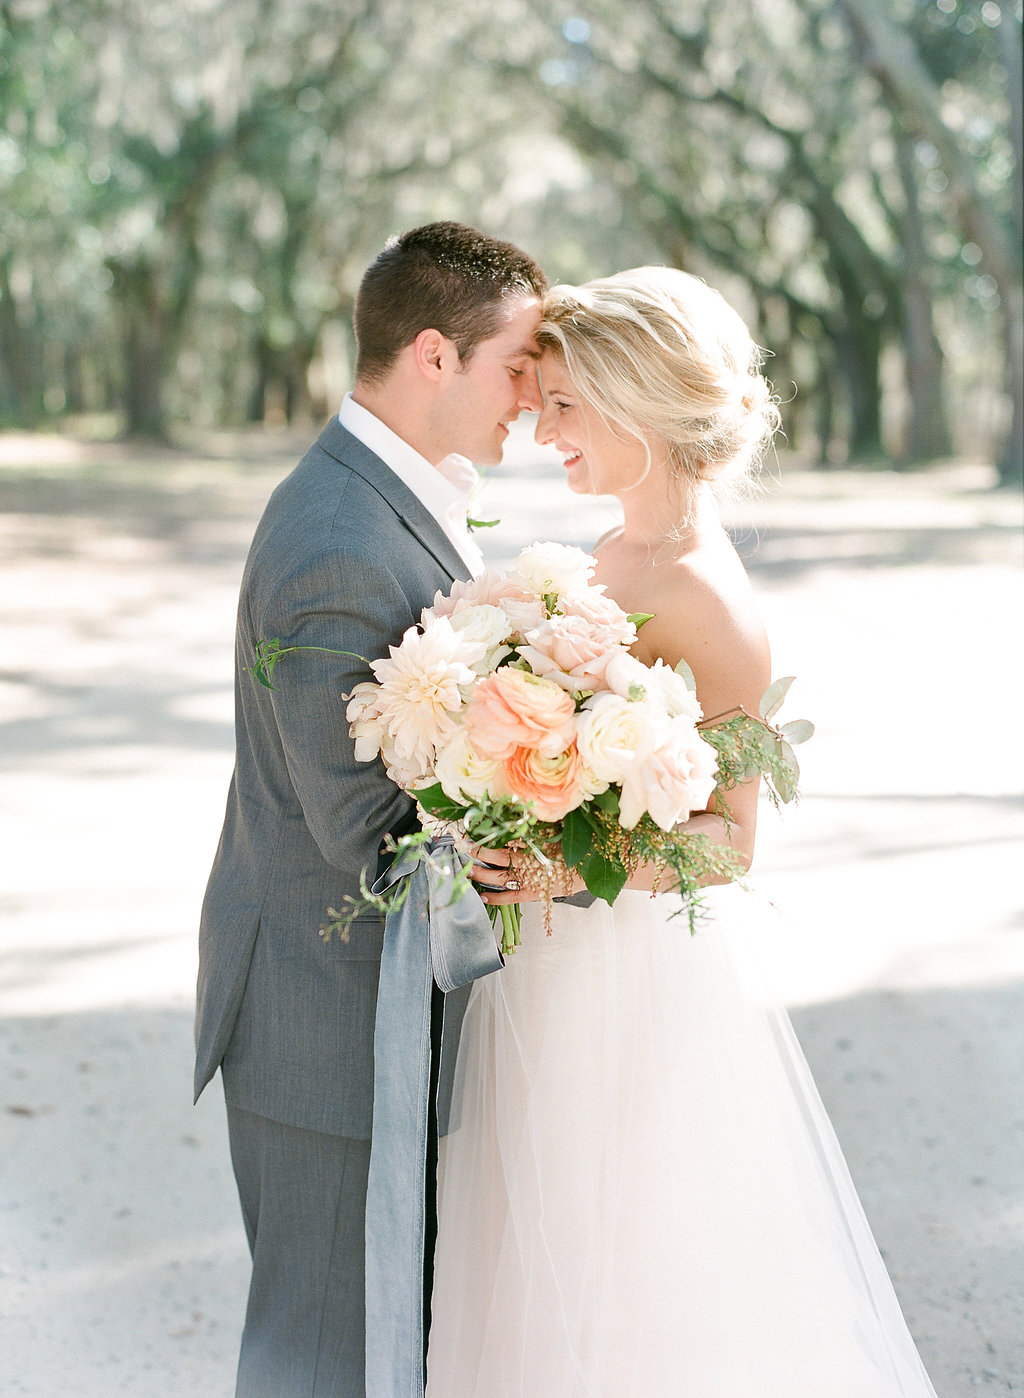 the-happy-bloom-wormsloe-wedding-savannah-wedding-ivory-and-beau-bridal-boutique-savannah-wedding-dresses-savannah-bridal-boutique-georgia-bridal-boutique-design-studio-south-sunset-wedding-blush-by-hayley-paige-candi-1550-blush-wedding-dress-17.jpg